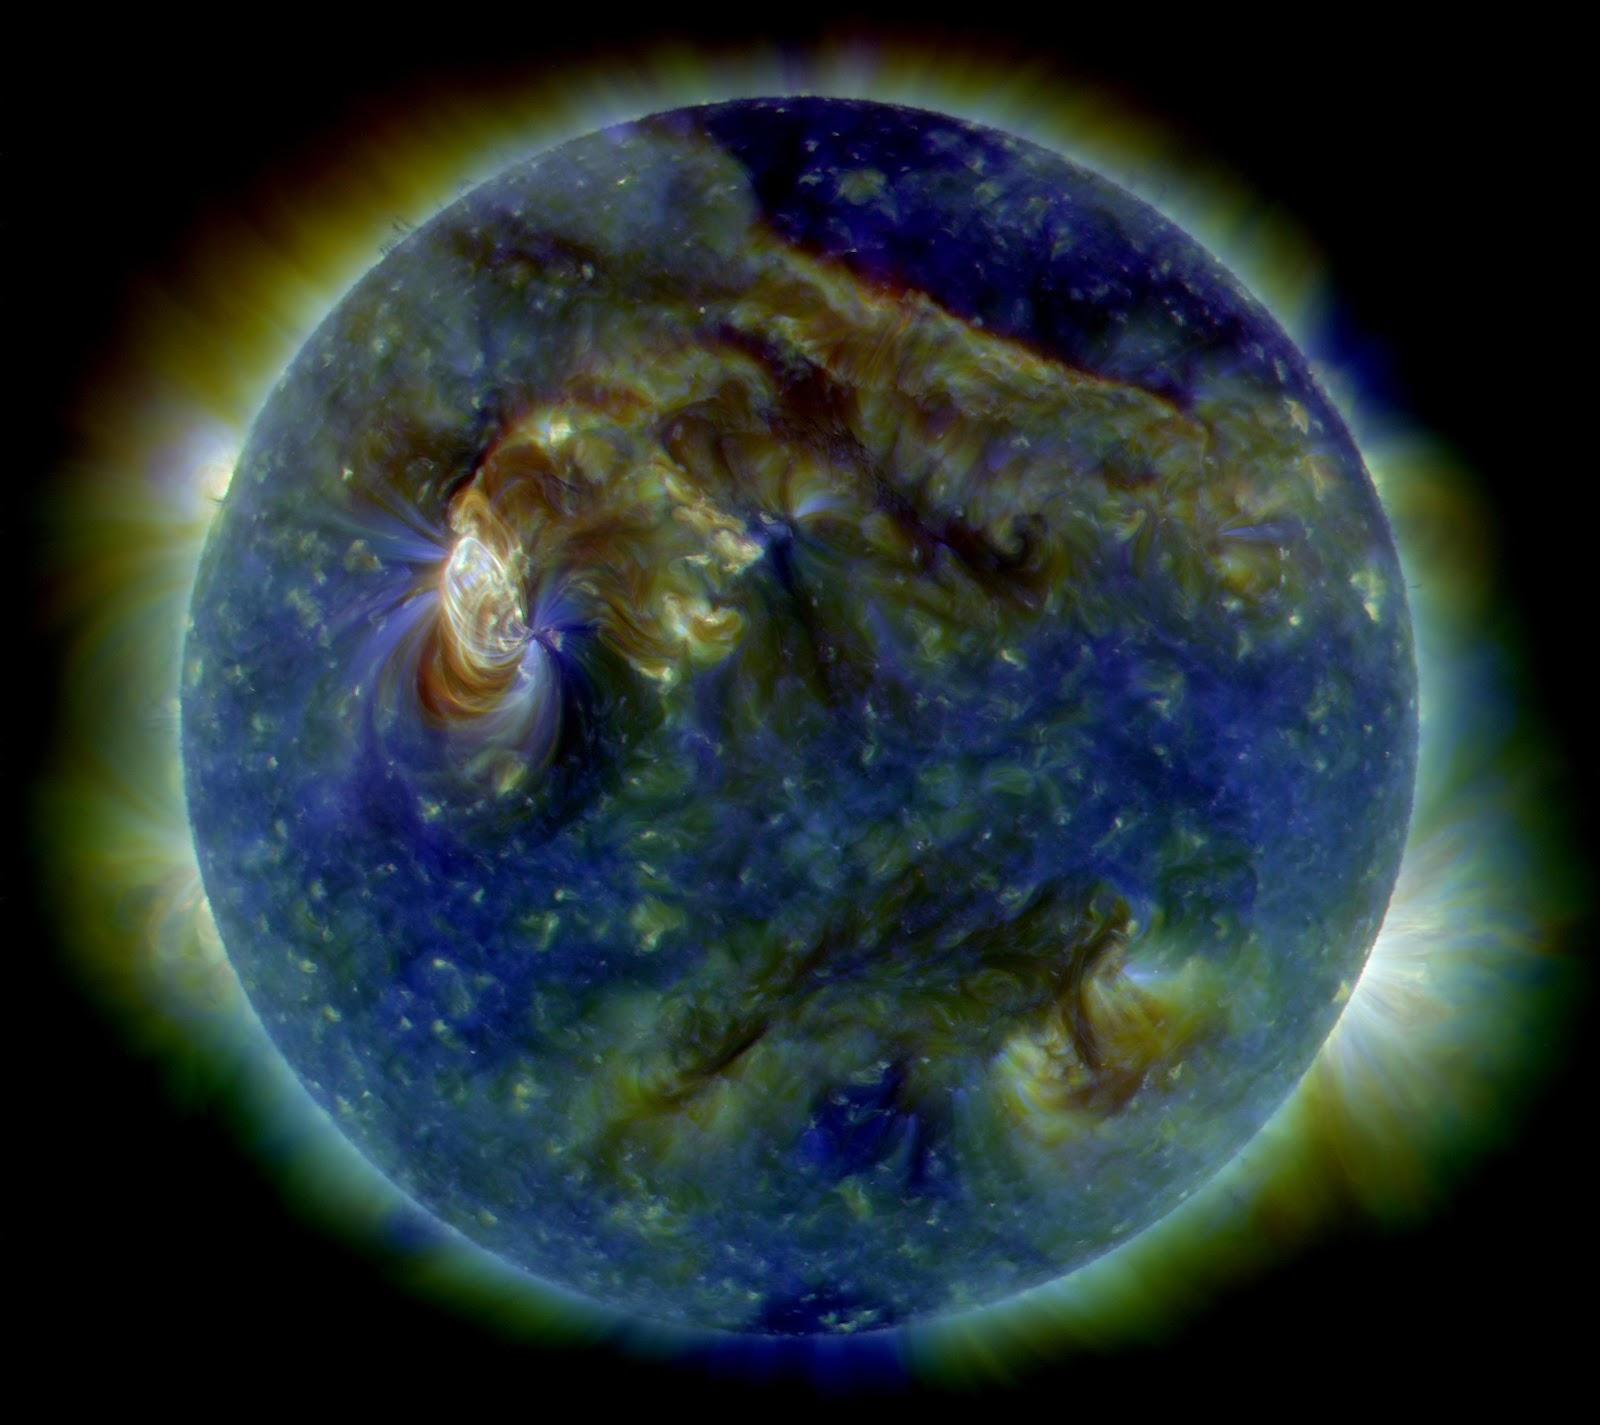 Sun_-_August_1%2C_2010.jpg